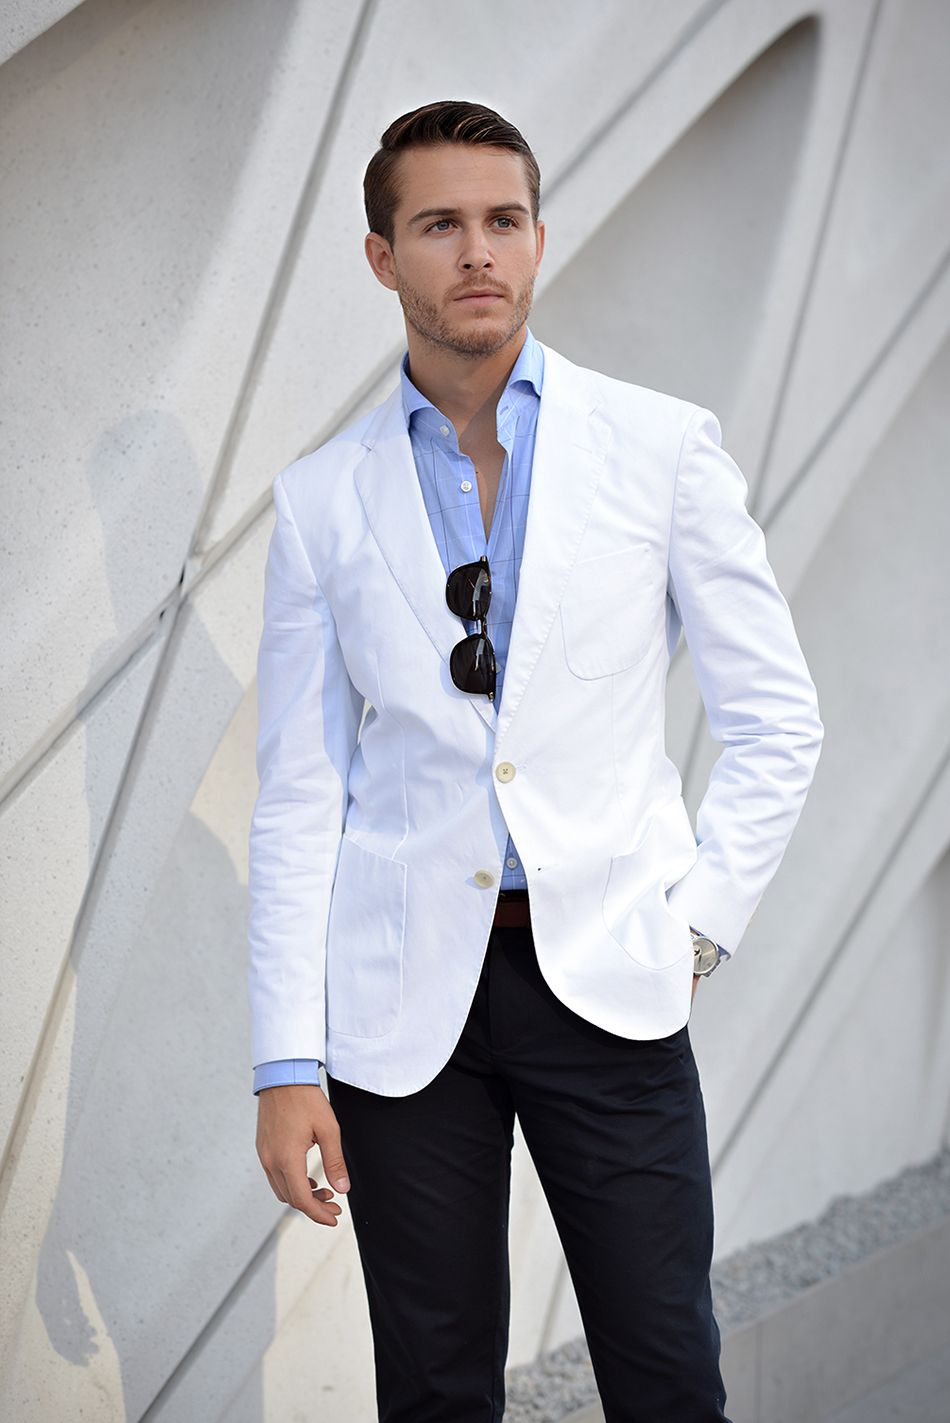 Mens jacket light blue - White Blazer Light Blue Checkered Shirt Navy Pants